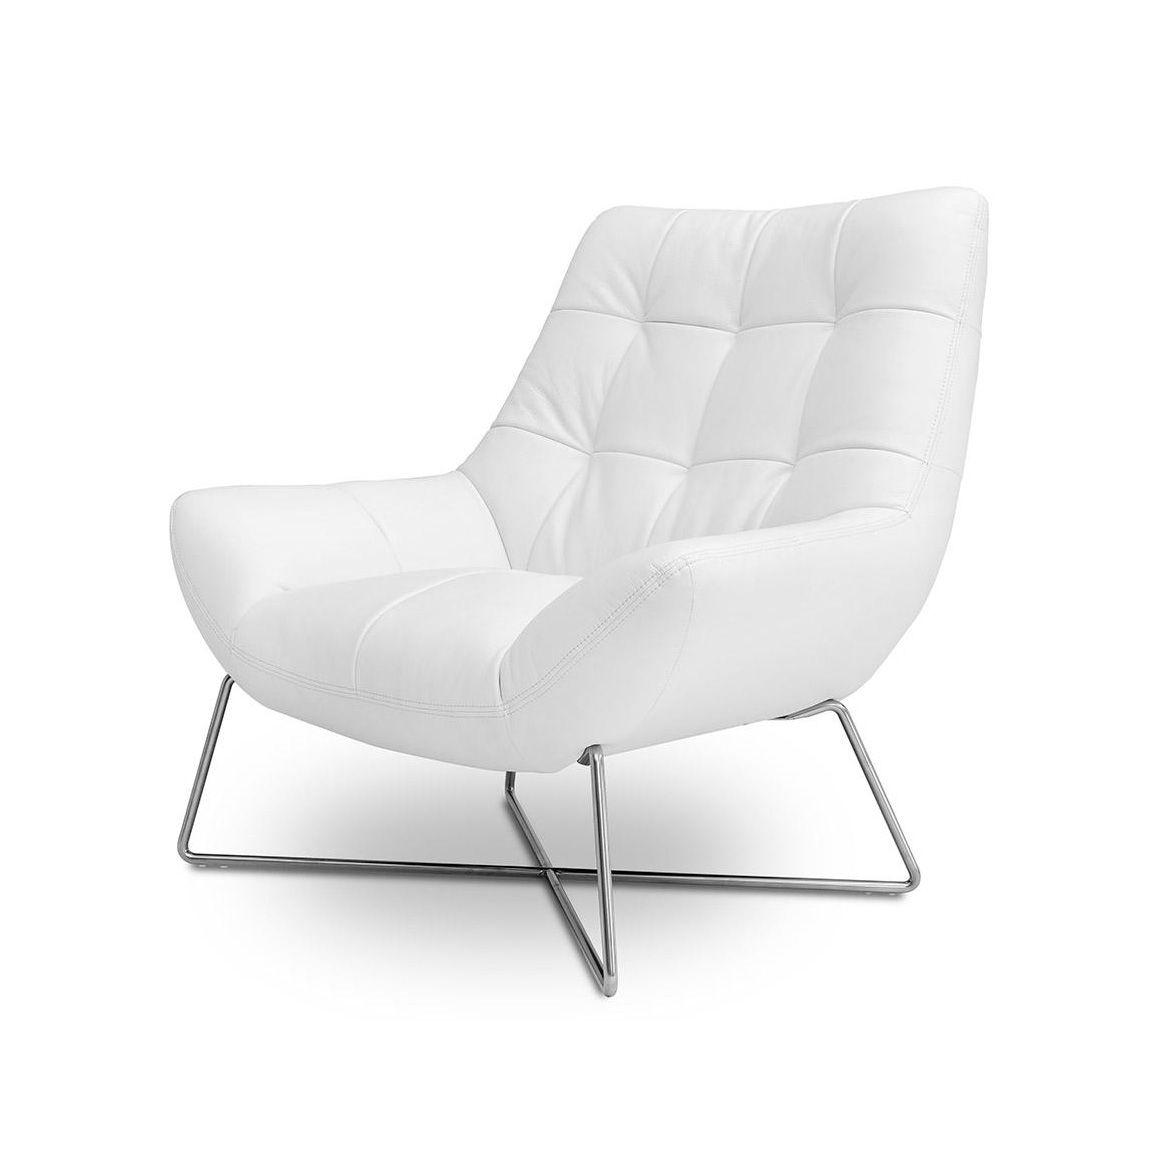 Xavier White Lounge Chair White Lounge Chair Modern White Chairs White Living Room Chairs